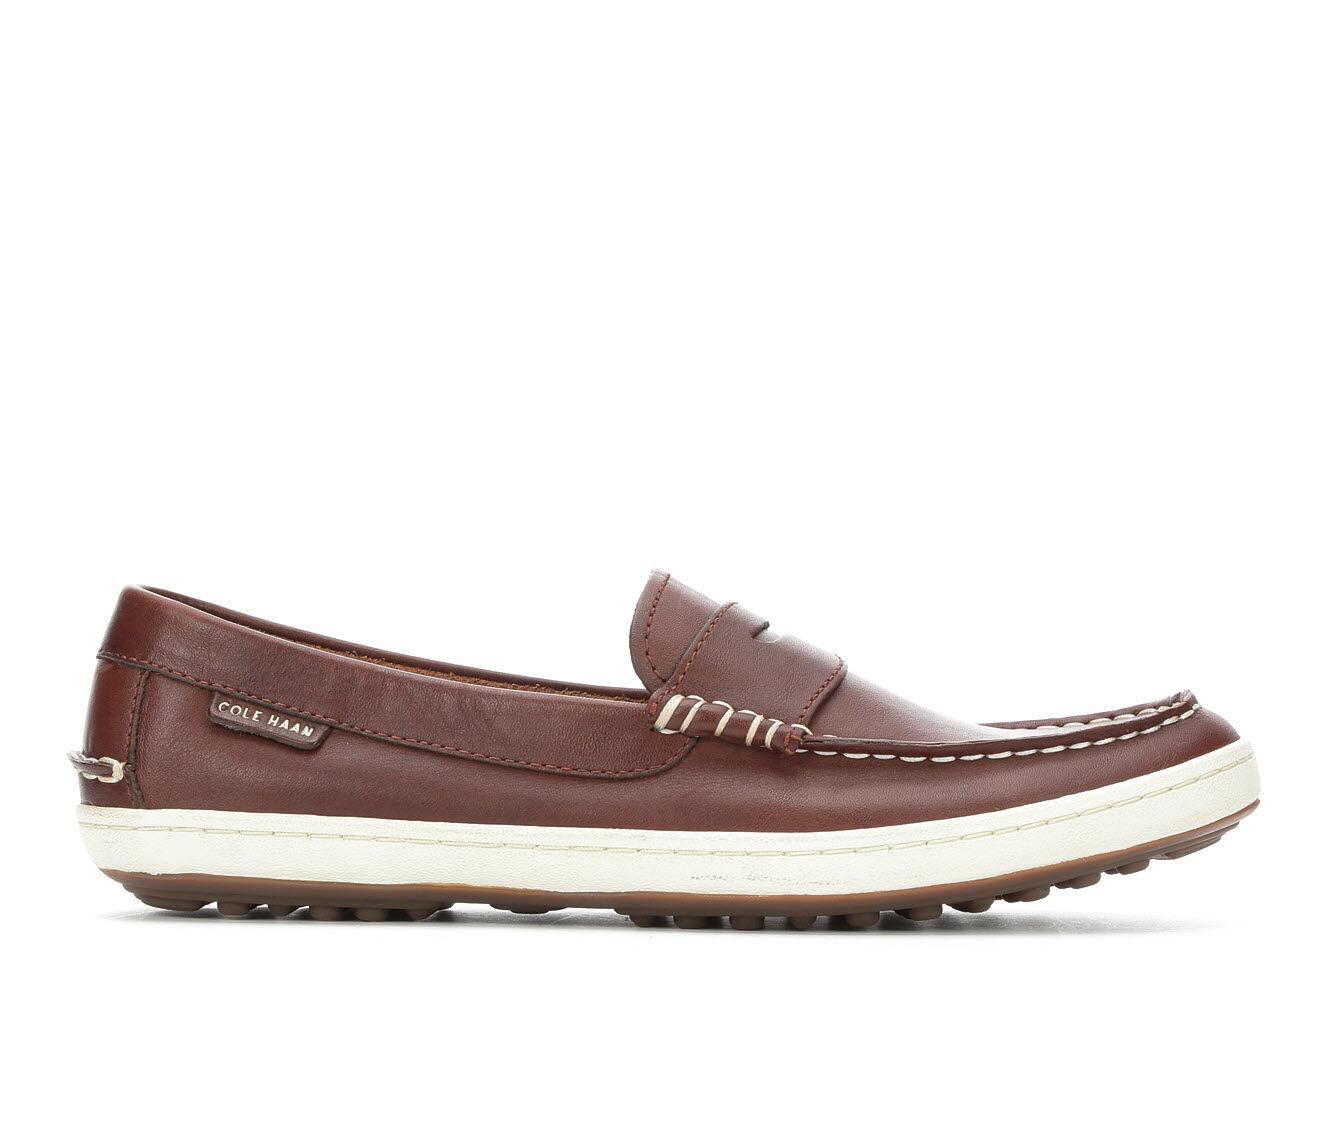 Men's Cole Haan Pinch Road Trip Penny Slip-On Shoes Woodbury